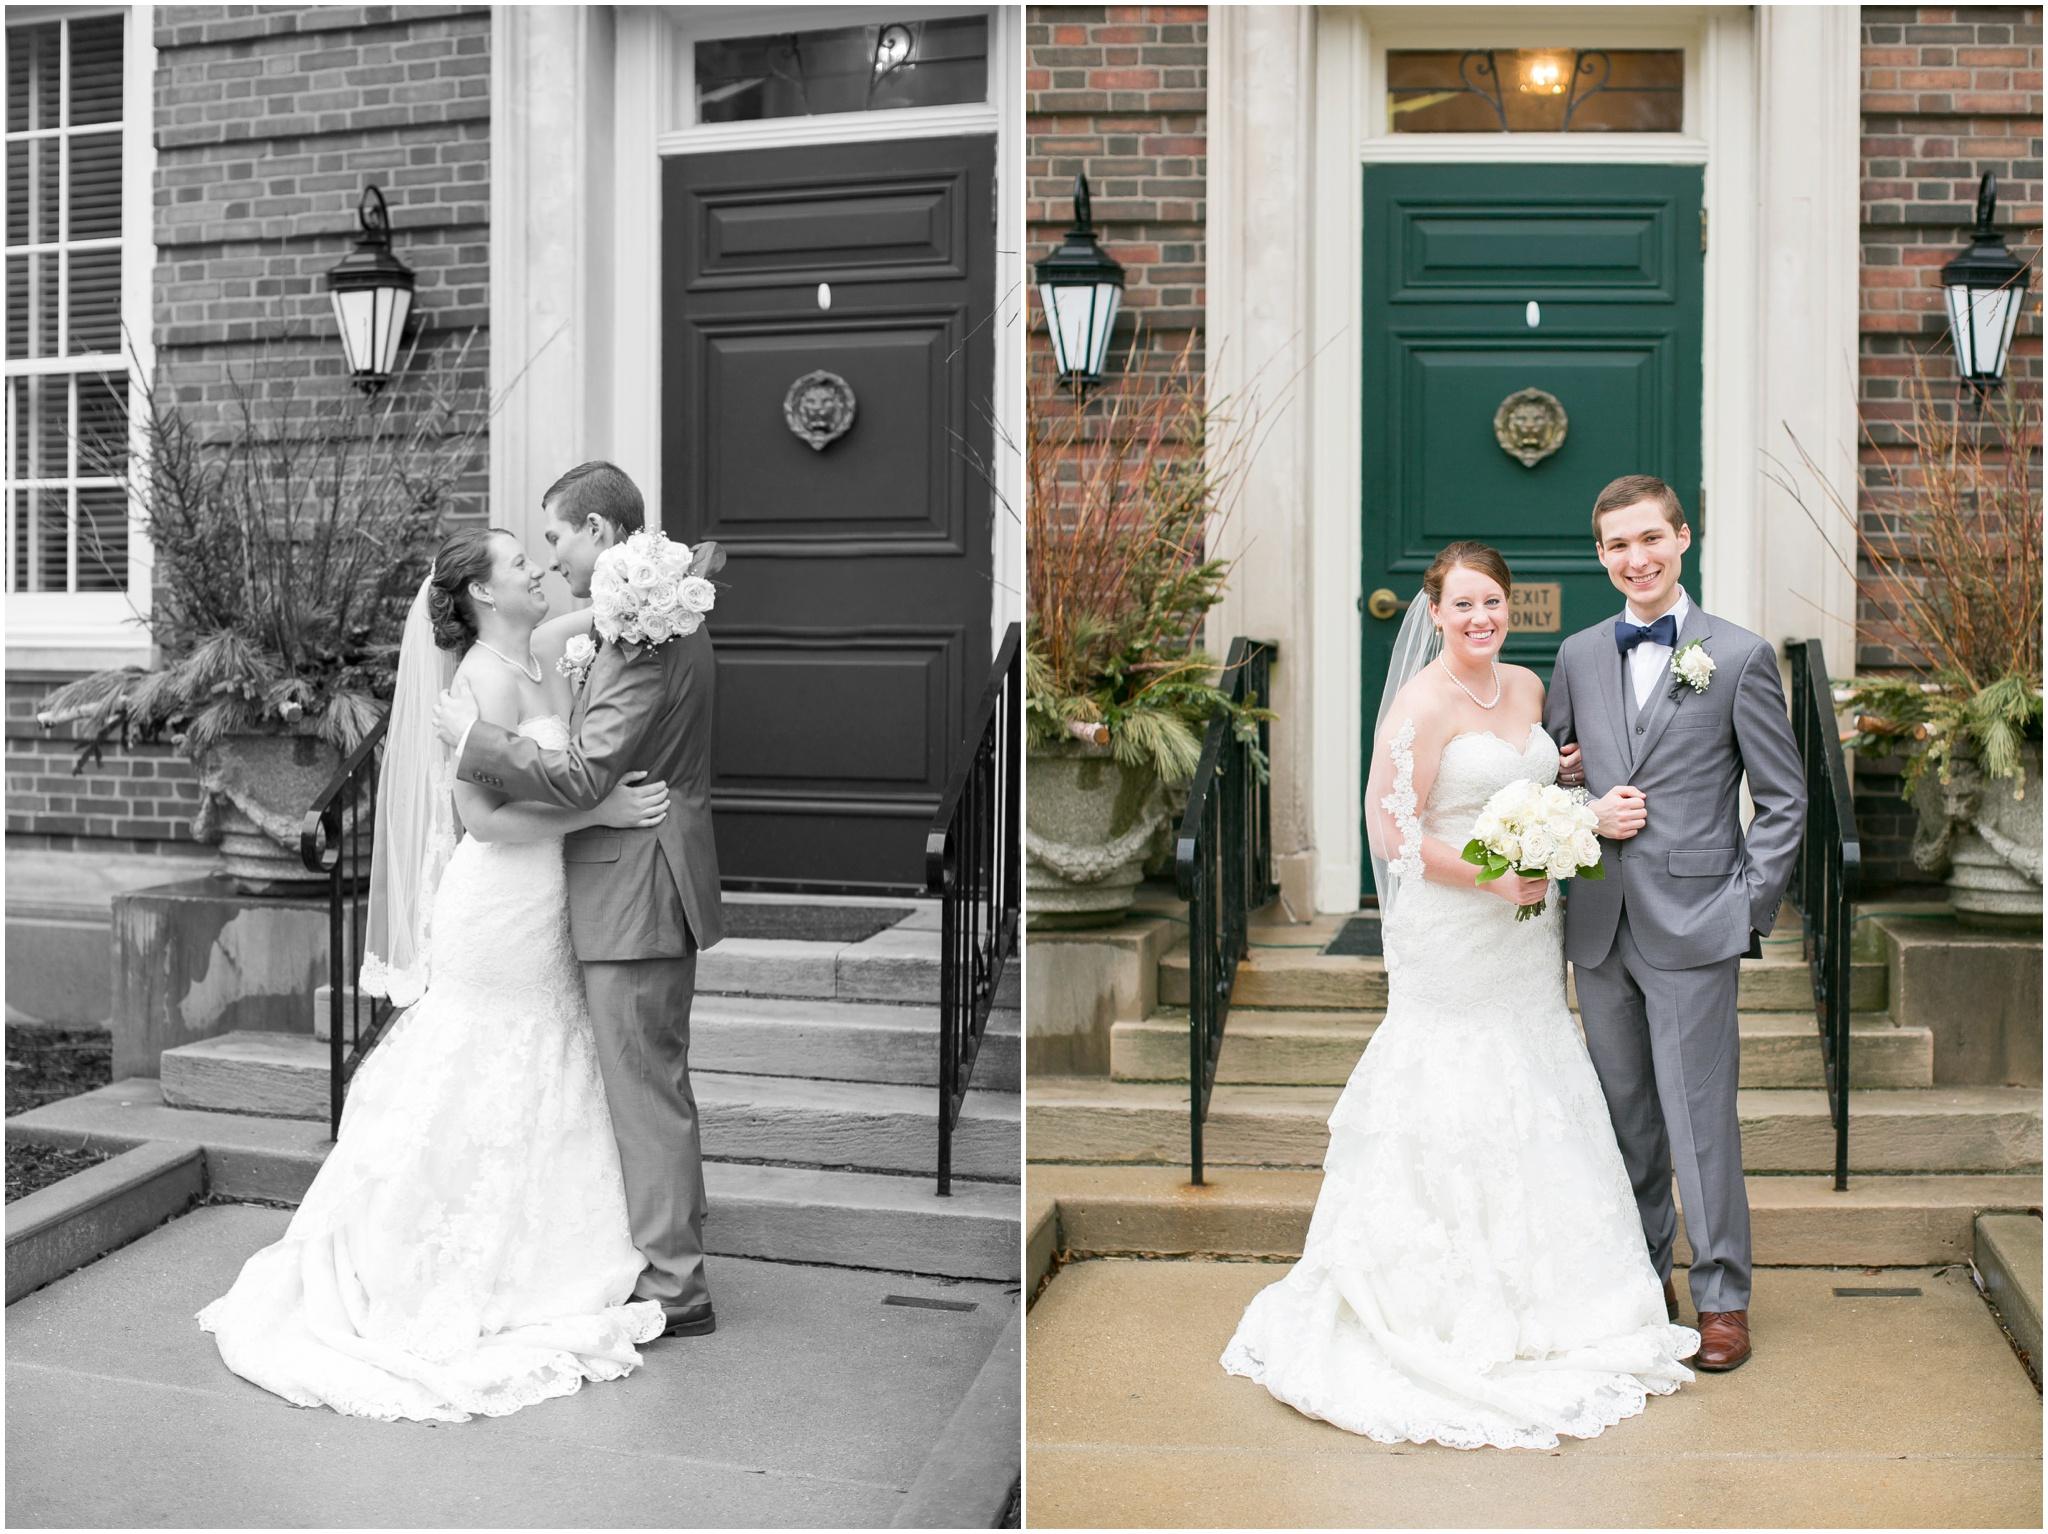 Madison_Club_Madison_Wisconsin_Wedding_Photographer_Spring_Rainy_Wedding_2620.jpg